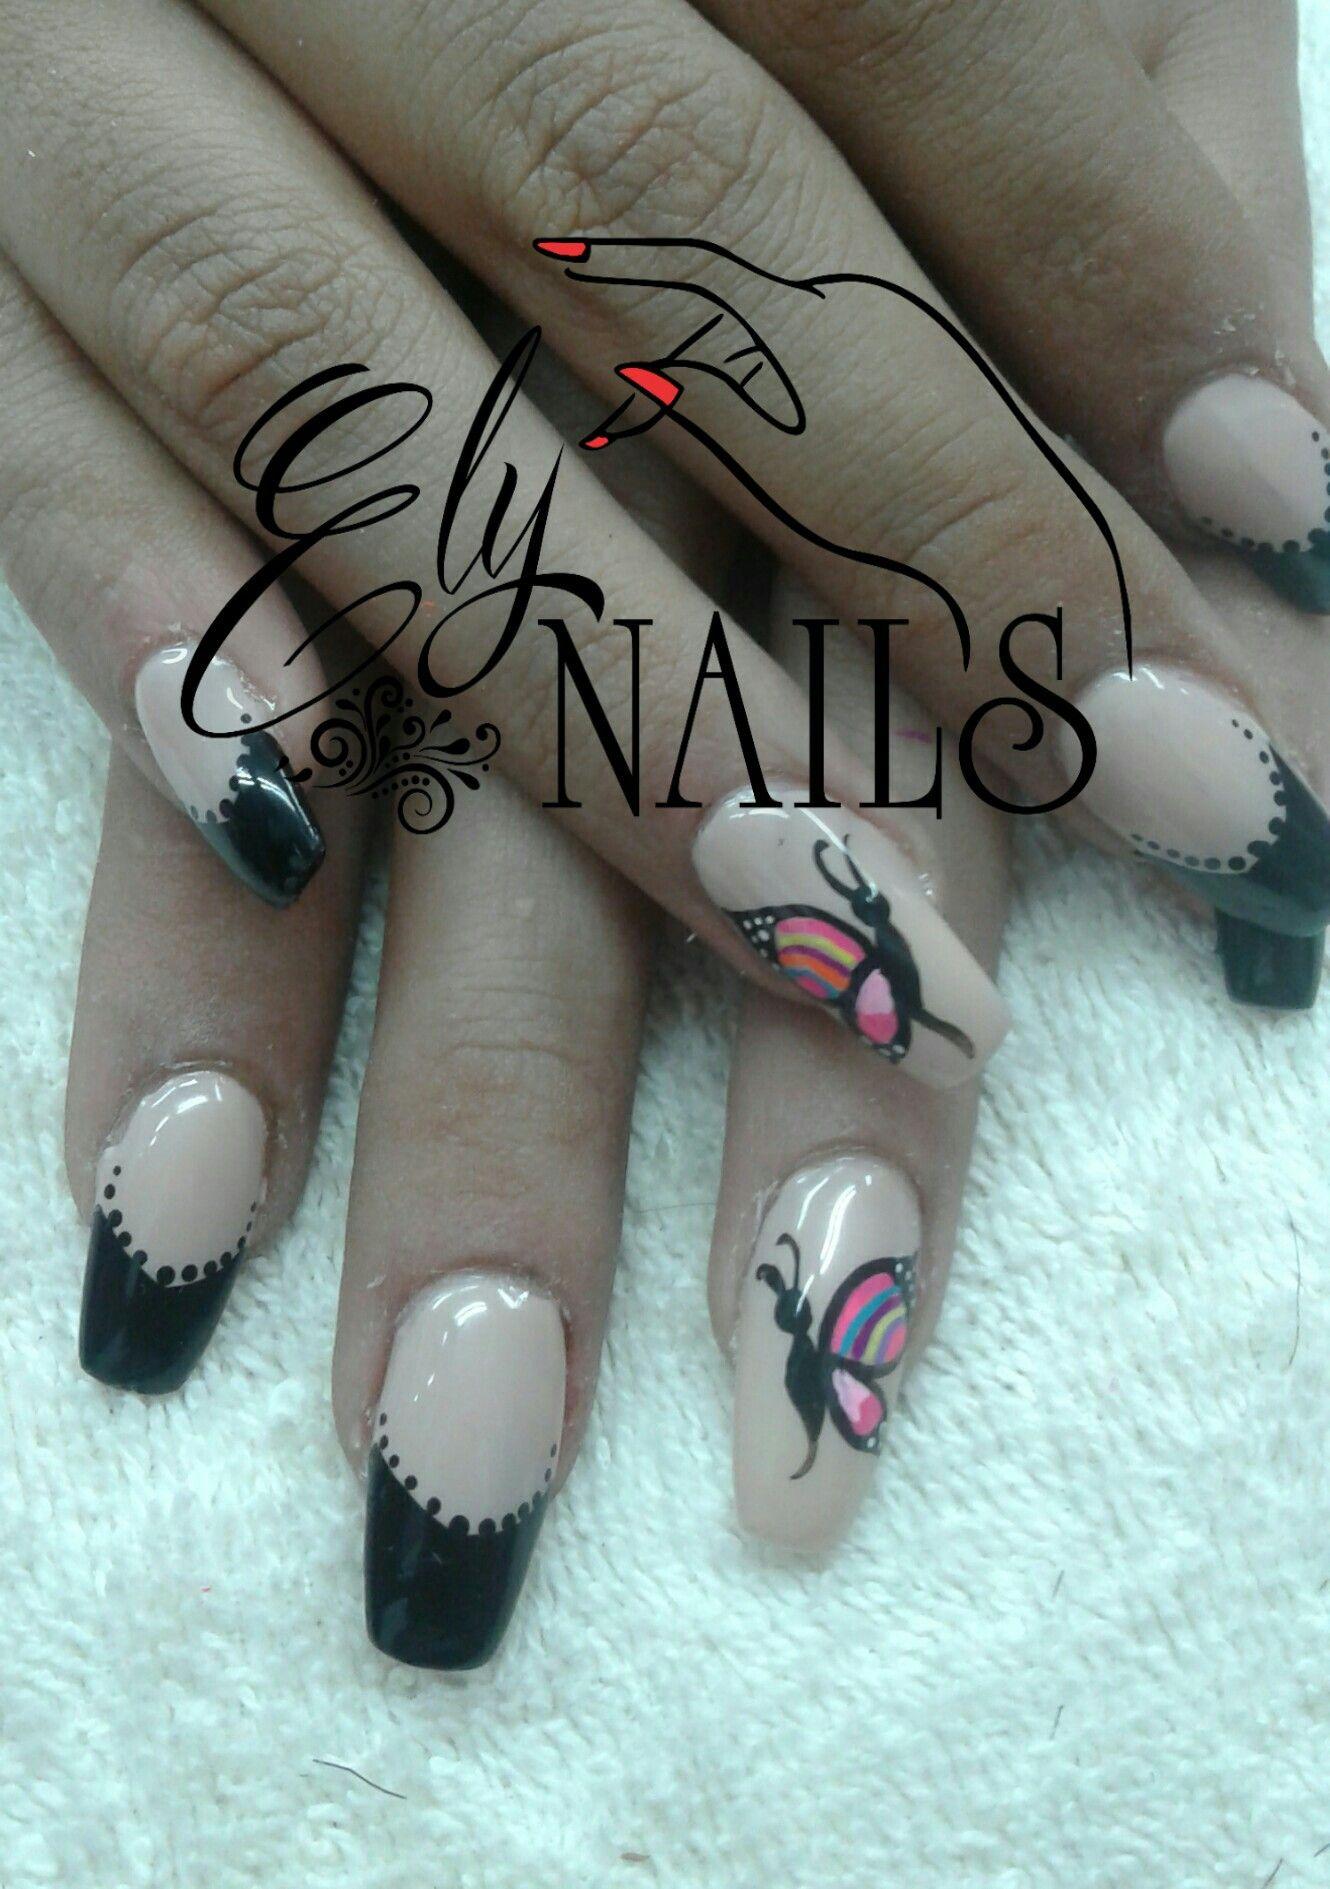 Pin De Ely Vega Castro En Ely Nails Pinterest Ely Y Nails